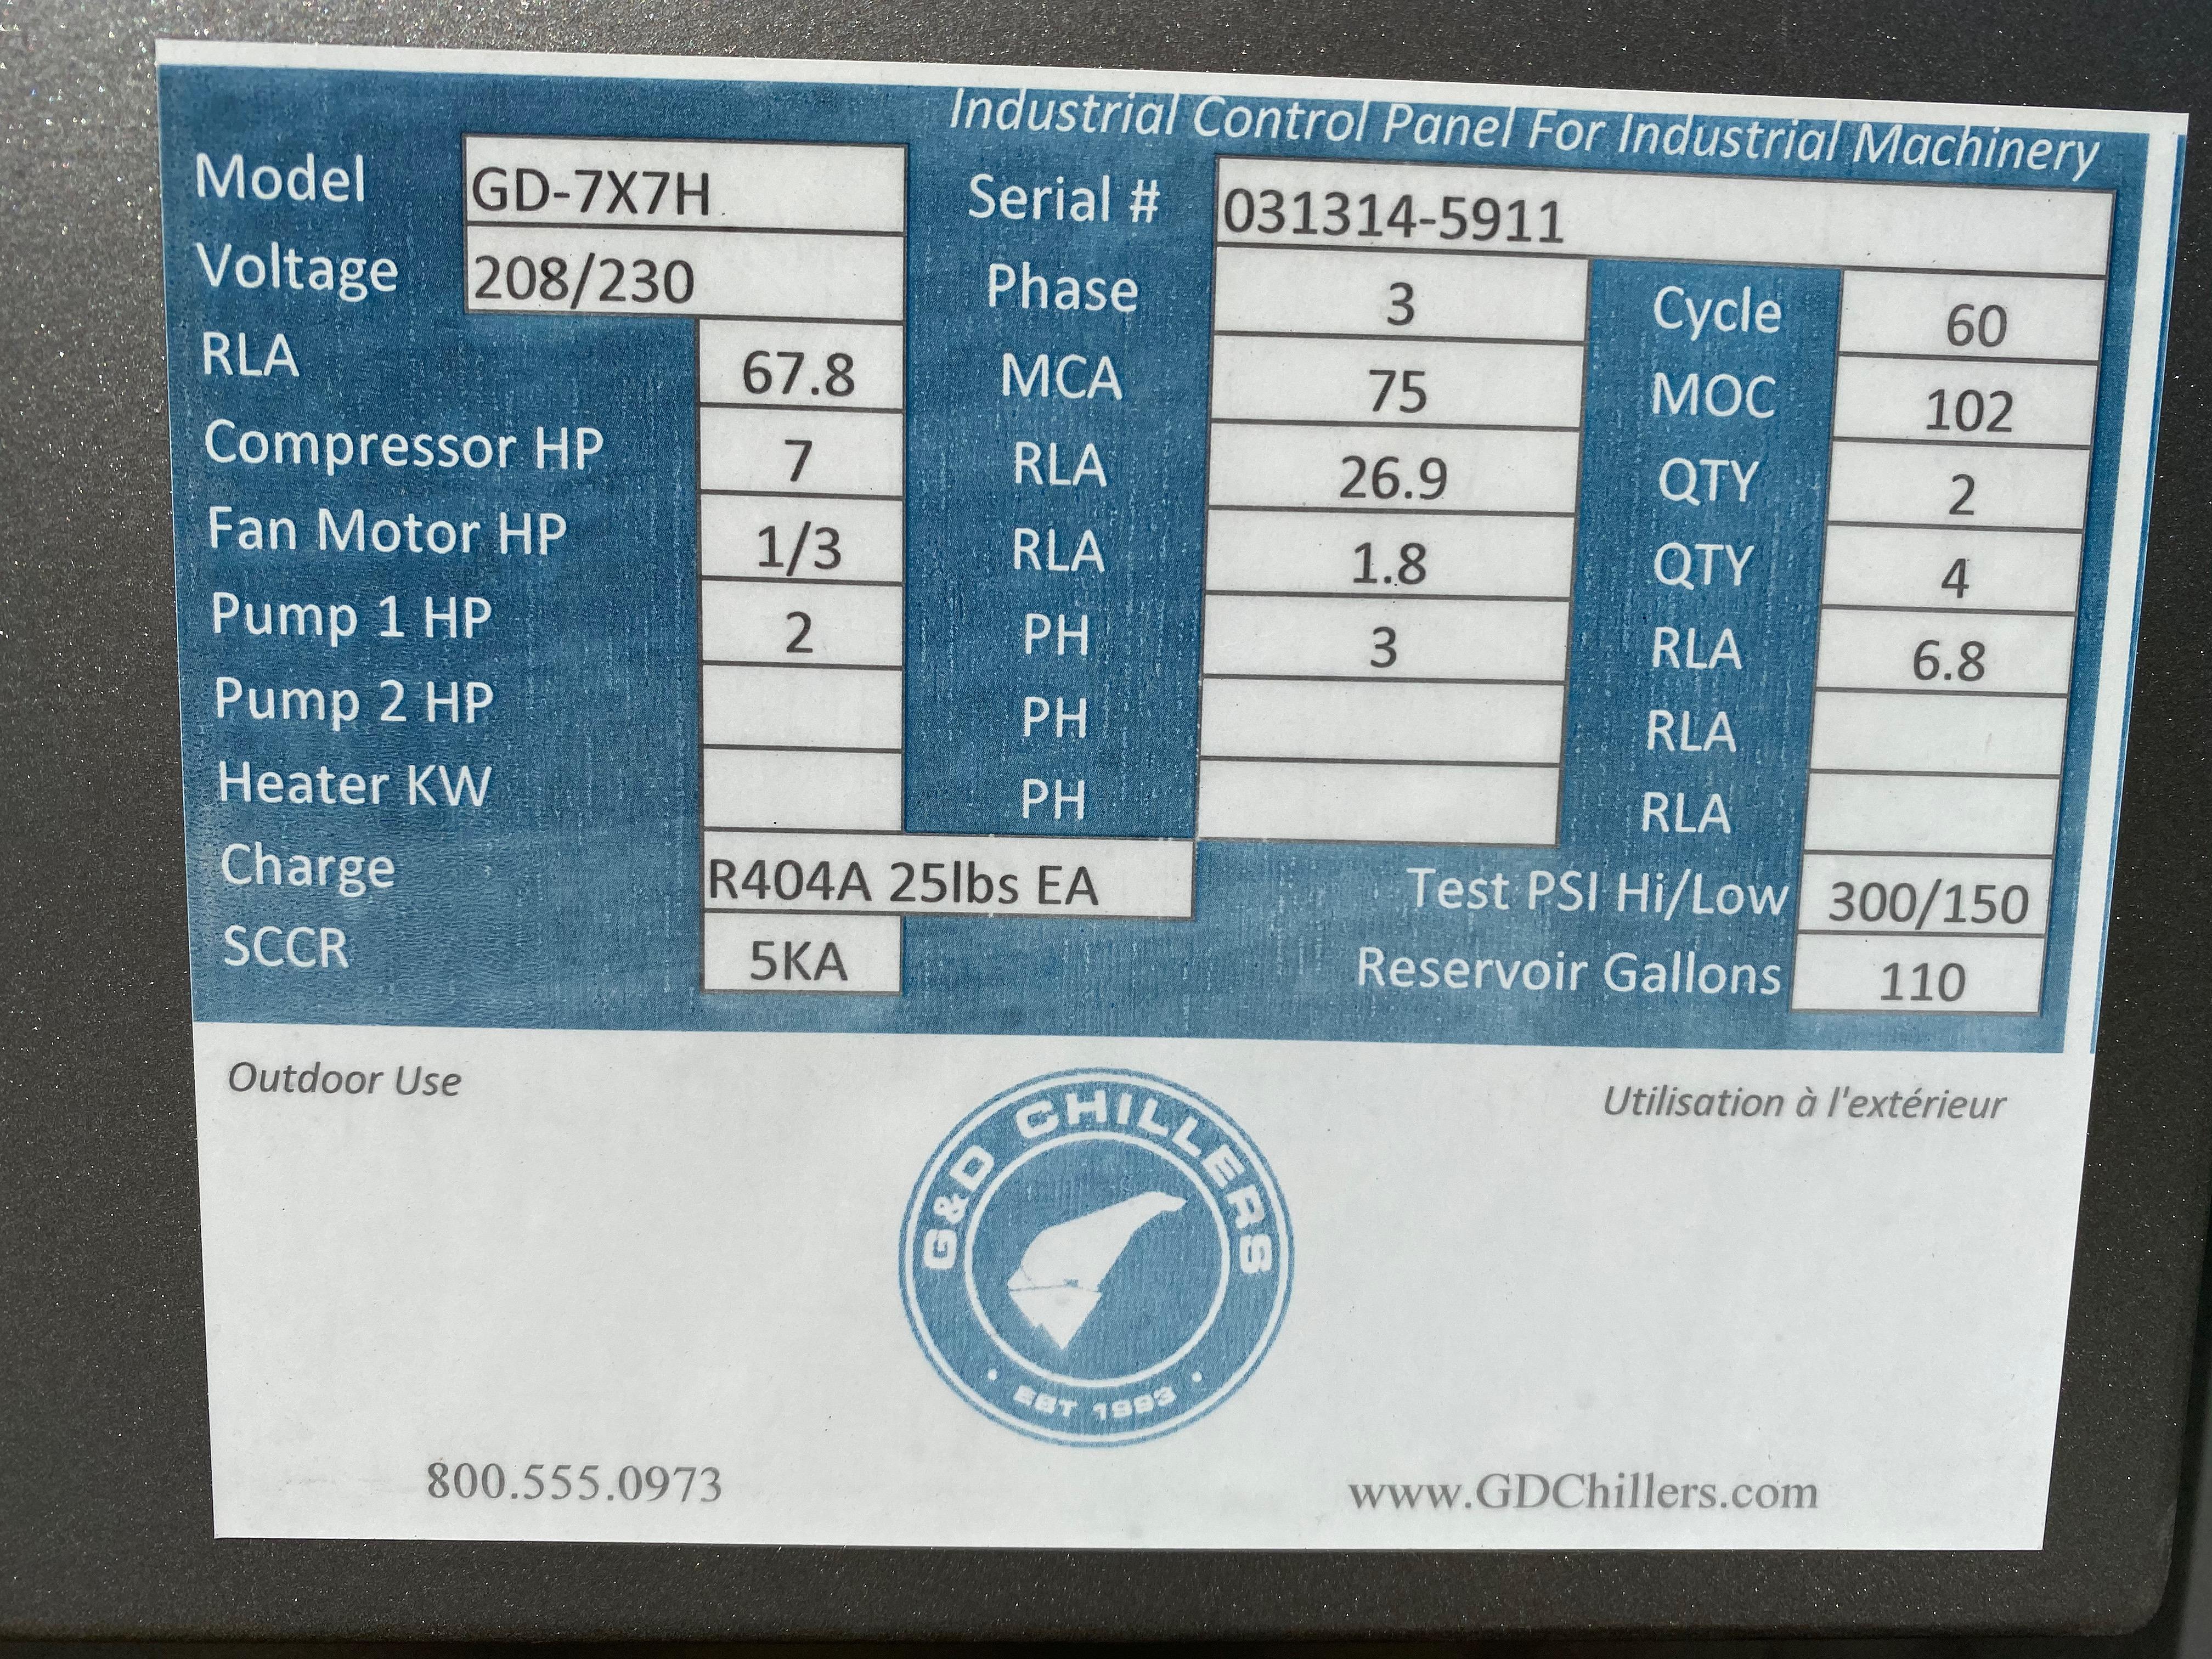 Lot 2 - 2014 G&D Model GD-7X7H Glycol Chiller, 7HP Compressor, S/N: 031314-5911 | Rig Fee: $1250